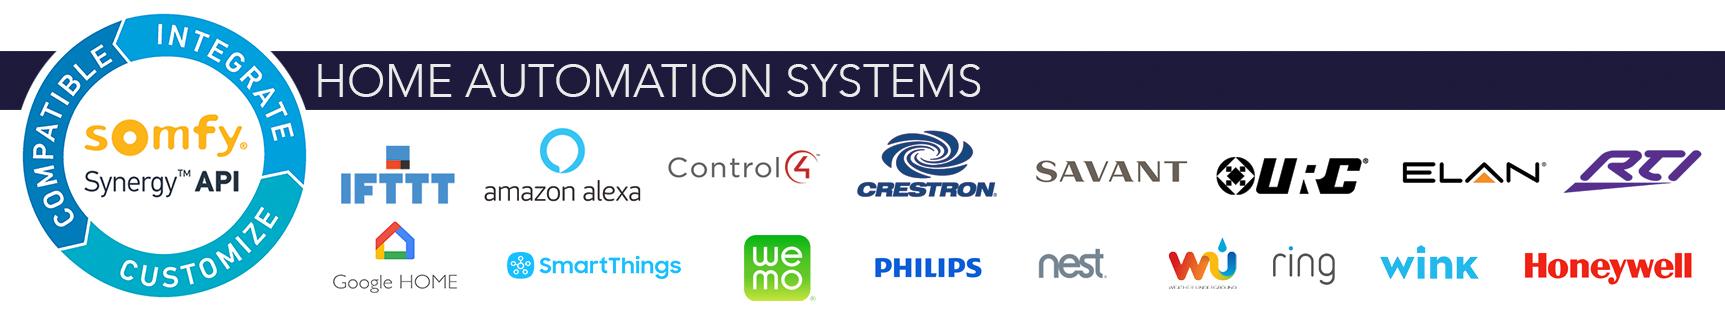 home-auto-systems-3.jpg